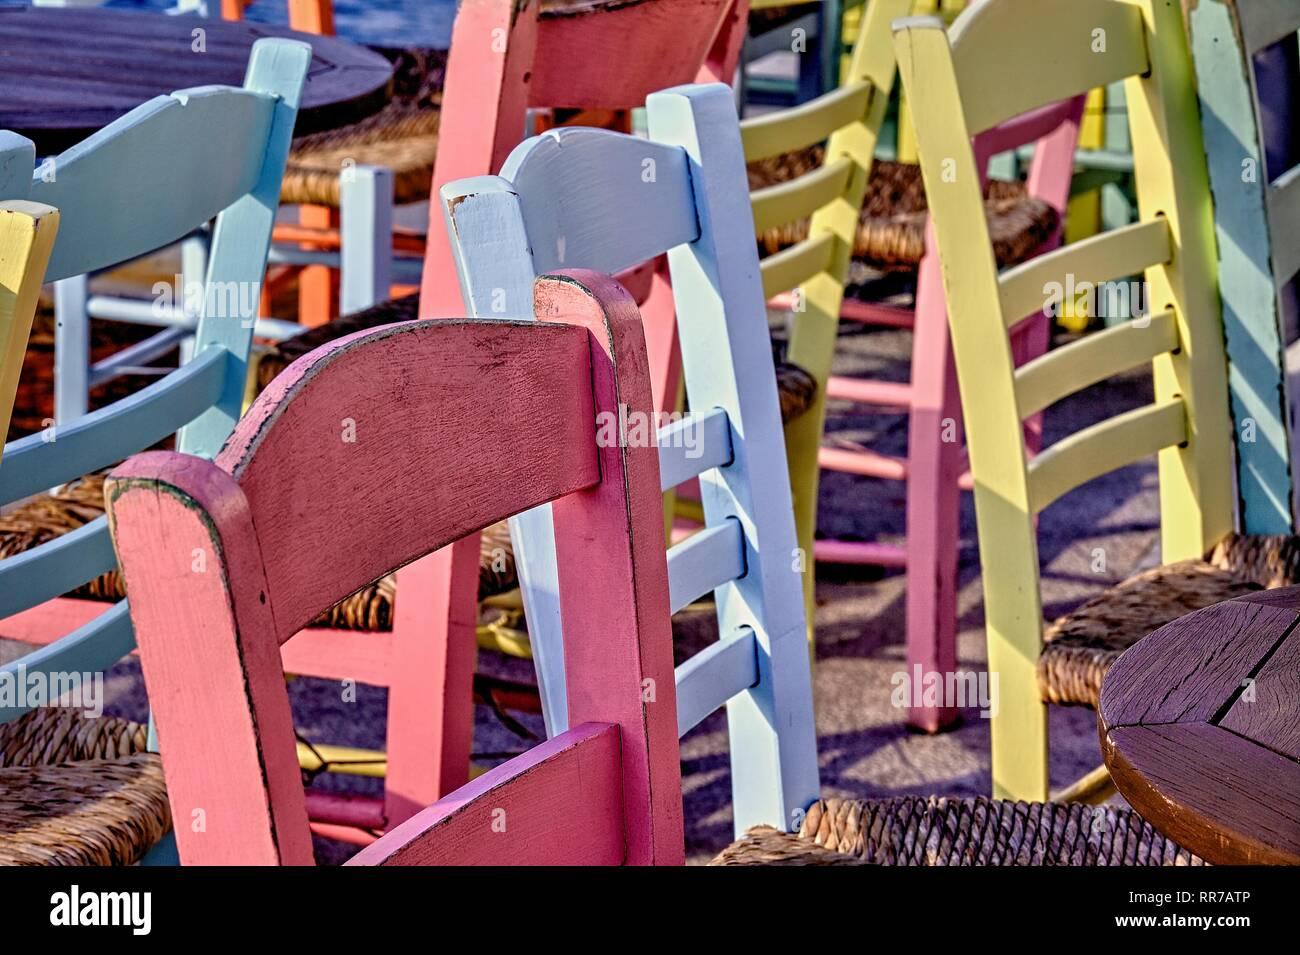 Bunte Stuhle Aus Holz Im Aussenbereich Foto Stockfotografie Alamy